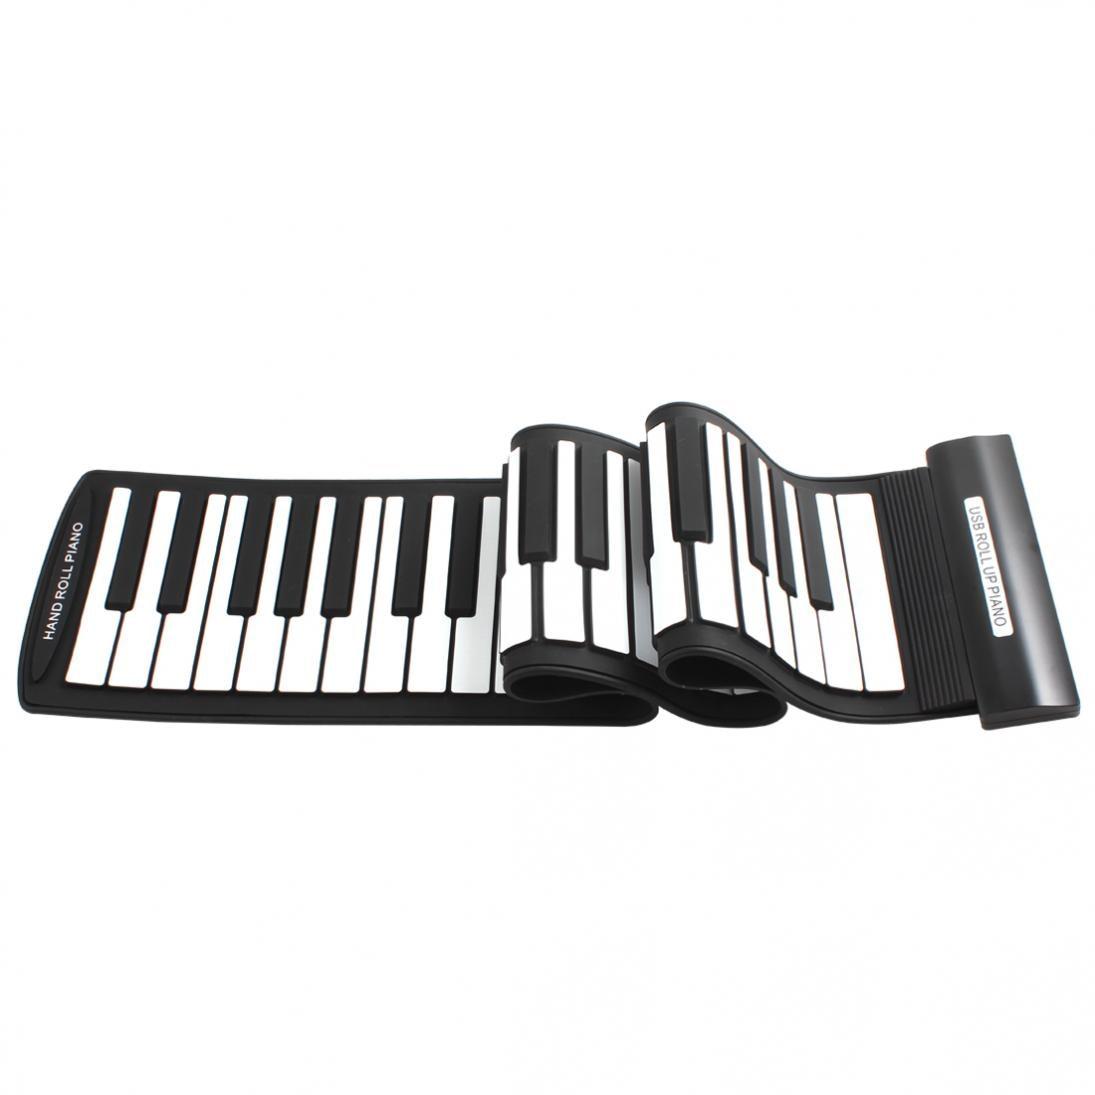 Keyboard, KONIX, MIDI, For, Electronic, Flexible